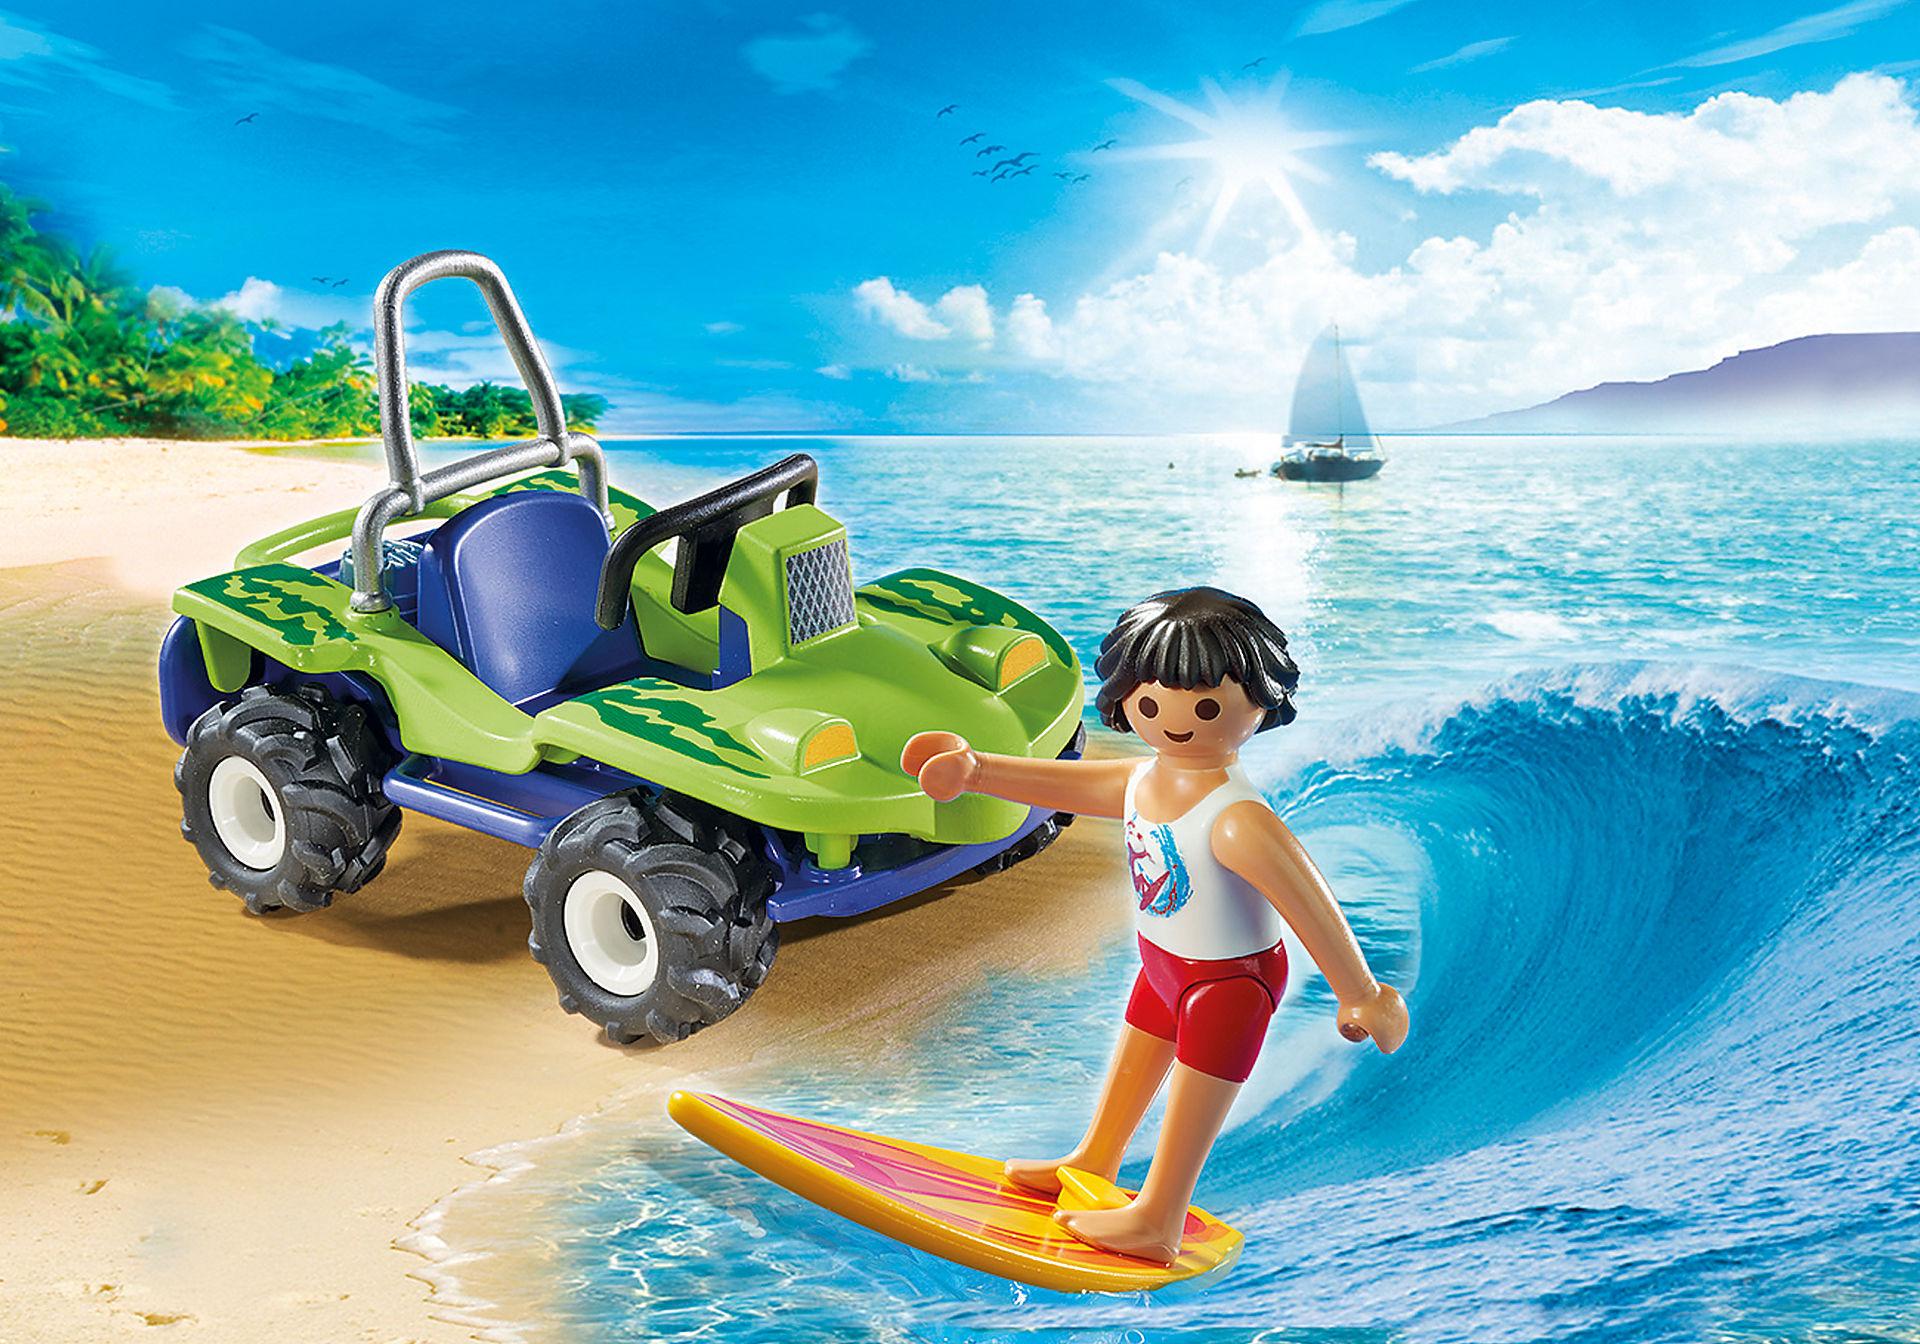 http://media.playmobil.com/i/playmobil/6982_product_detail/Σέρφερ με αυτοκίνητο buggy